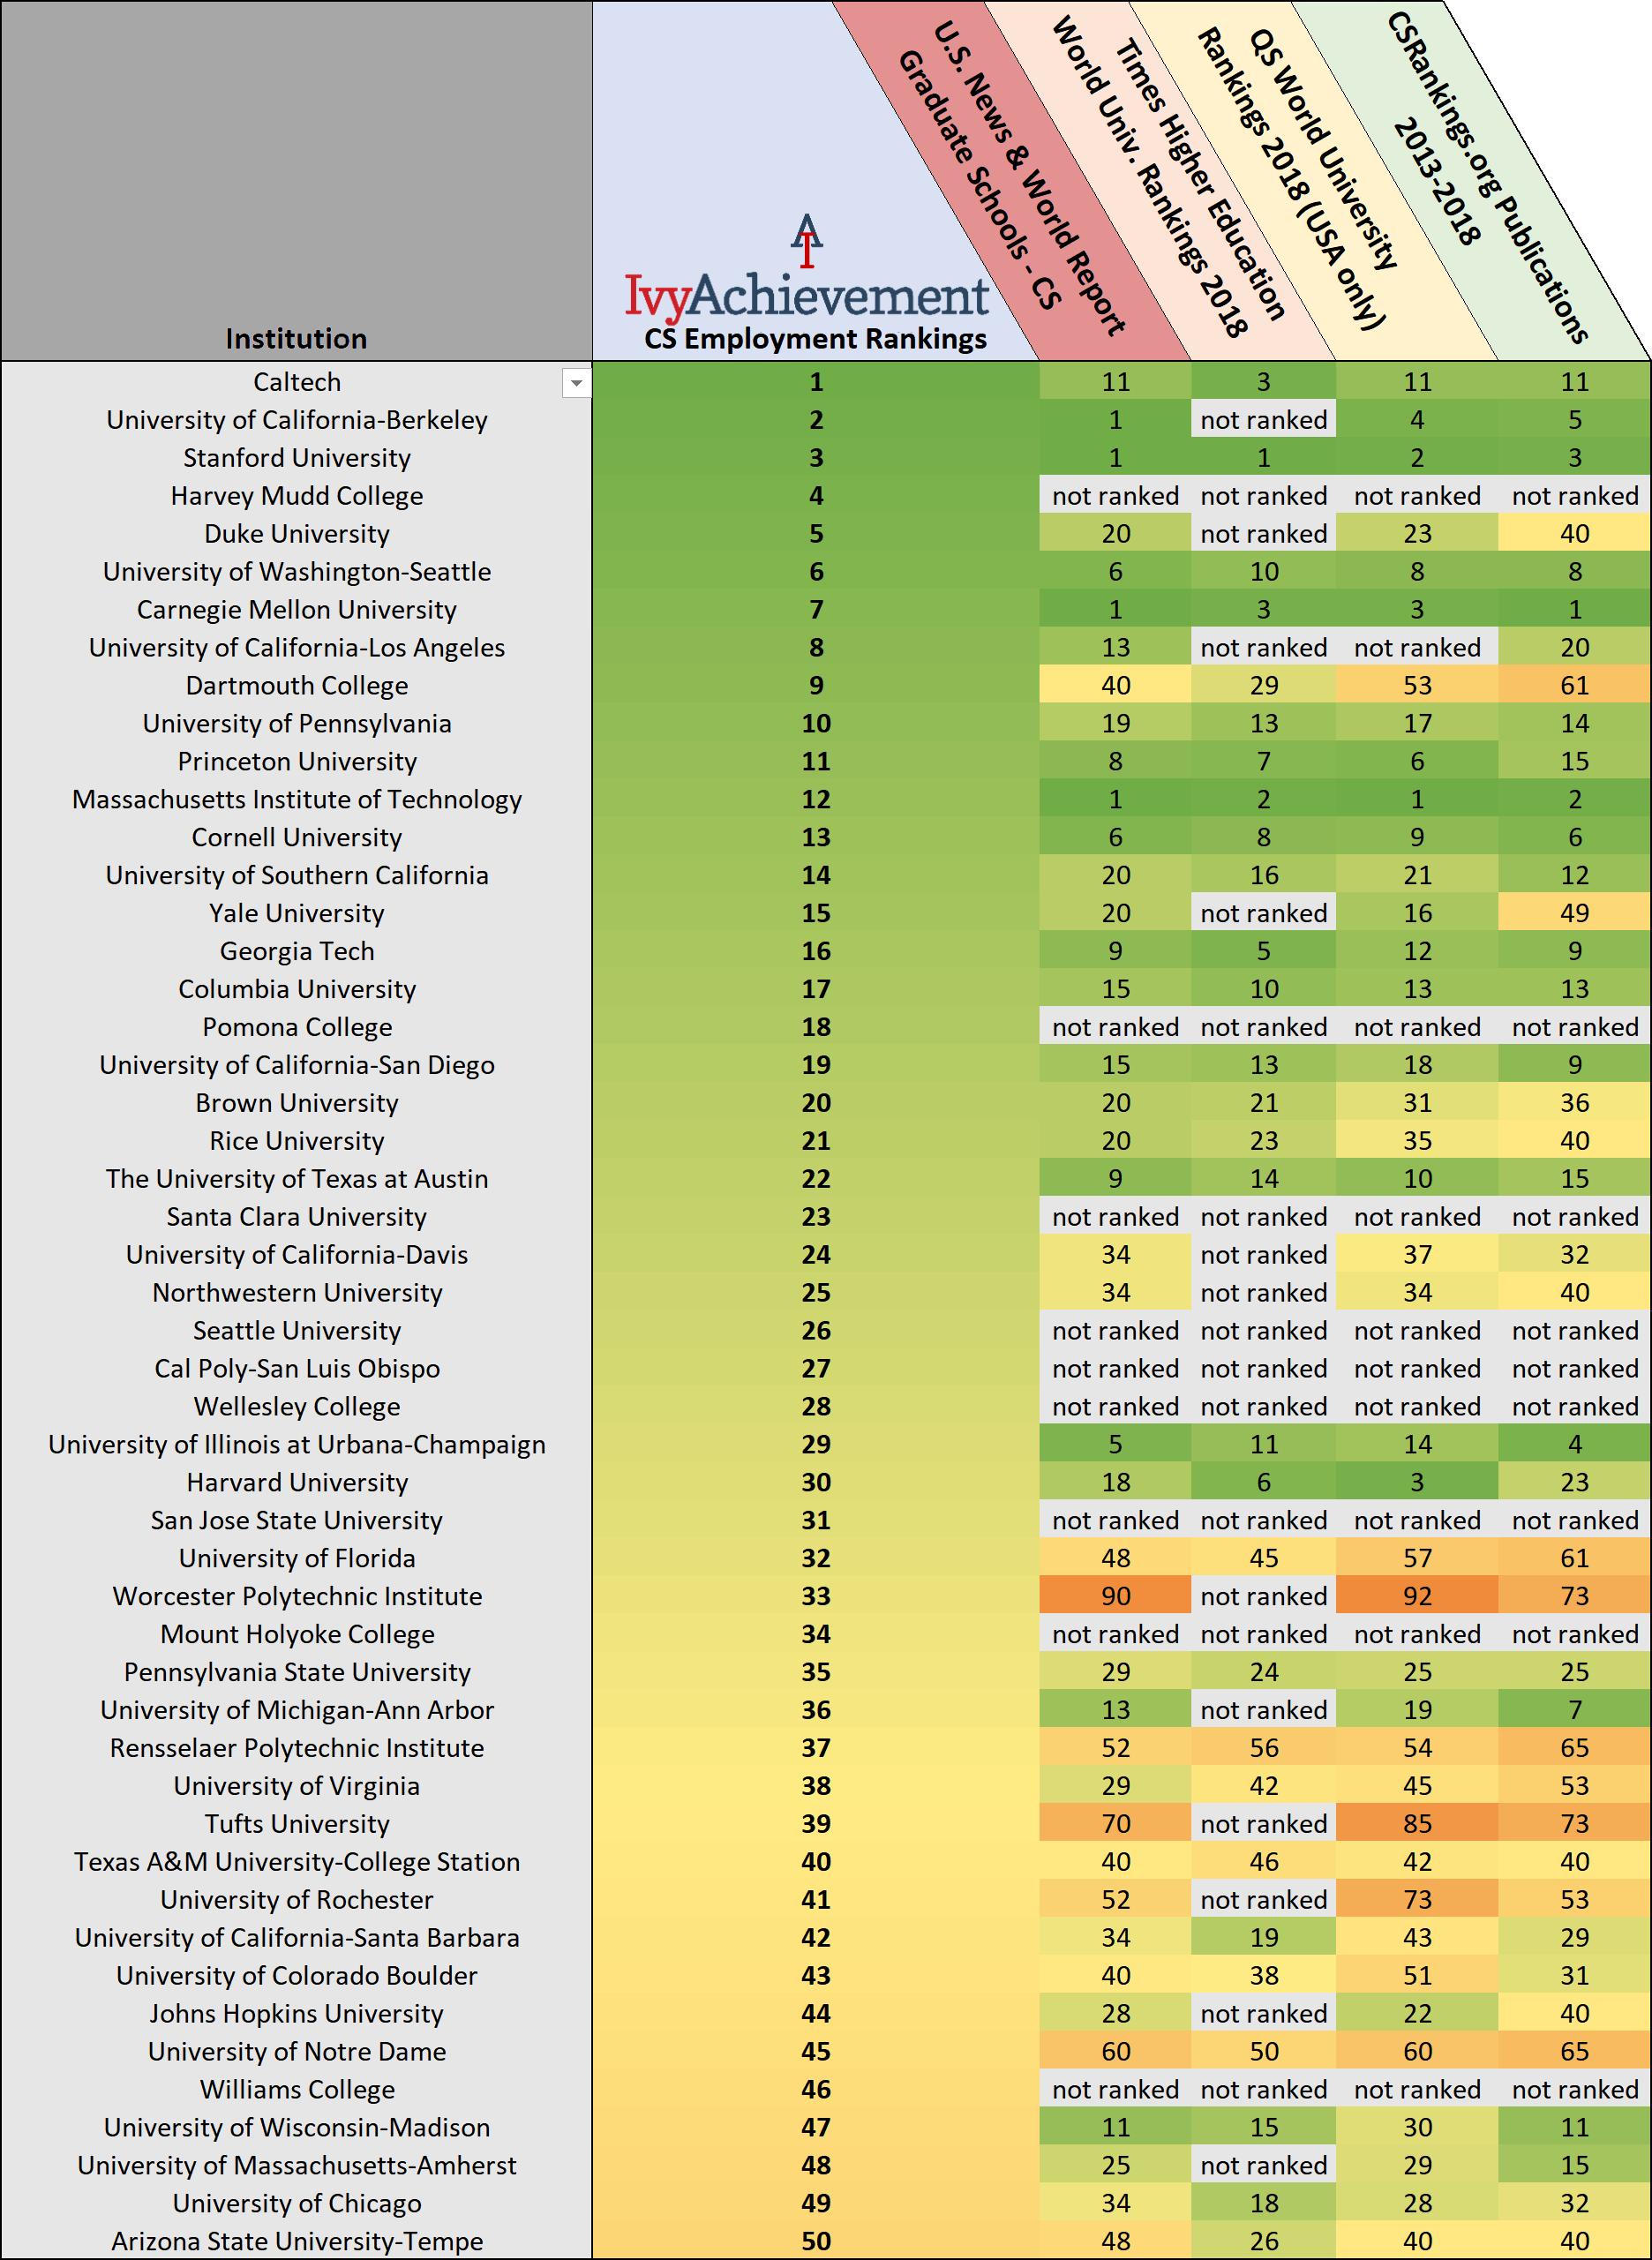 IvyAchievement CS rankings vs others table